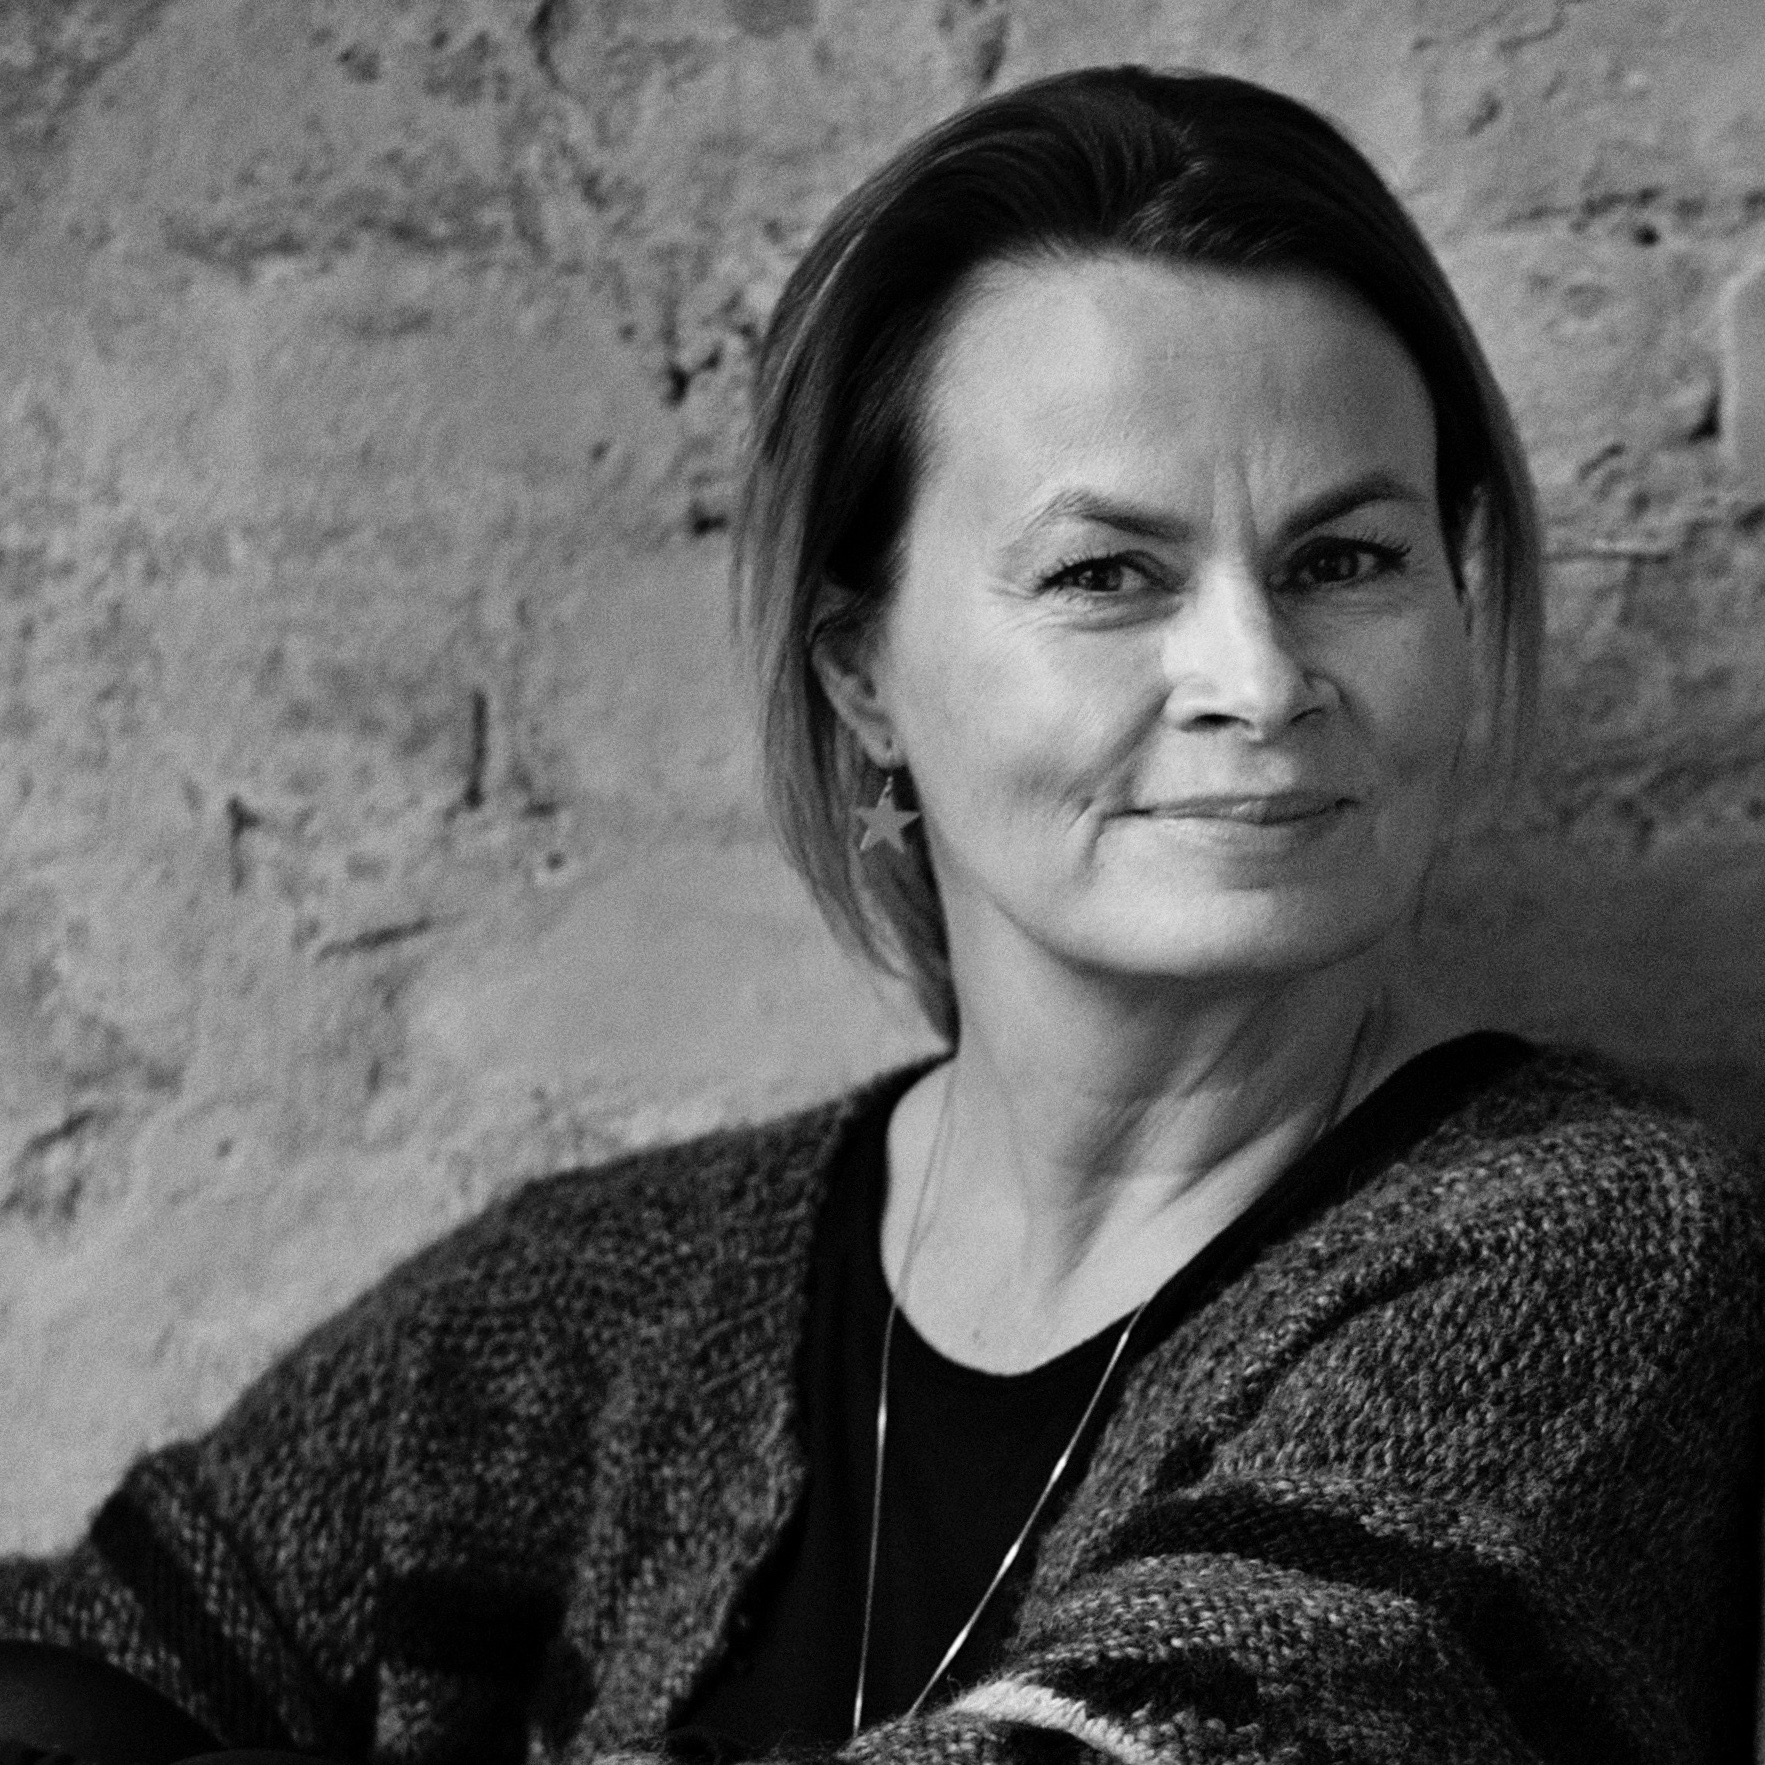 Caroline von Hoyningen-Huun   Design Manager & Founding Partner  +47 90 66 55 52  Caroline @volum2.no